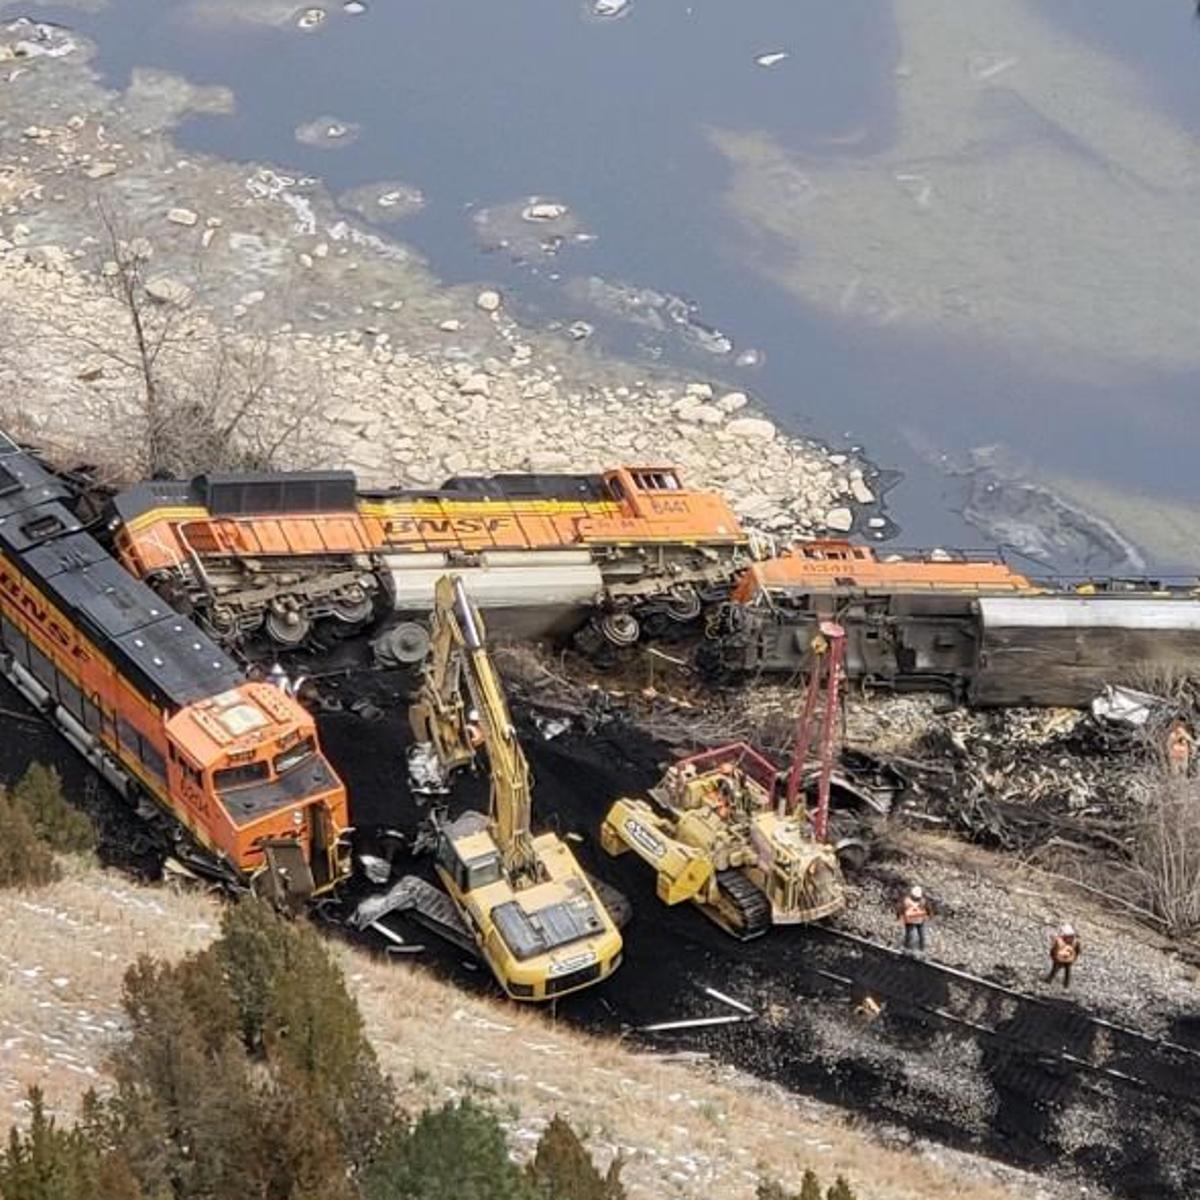 Crew injured, diesel fuel spilled into river when train